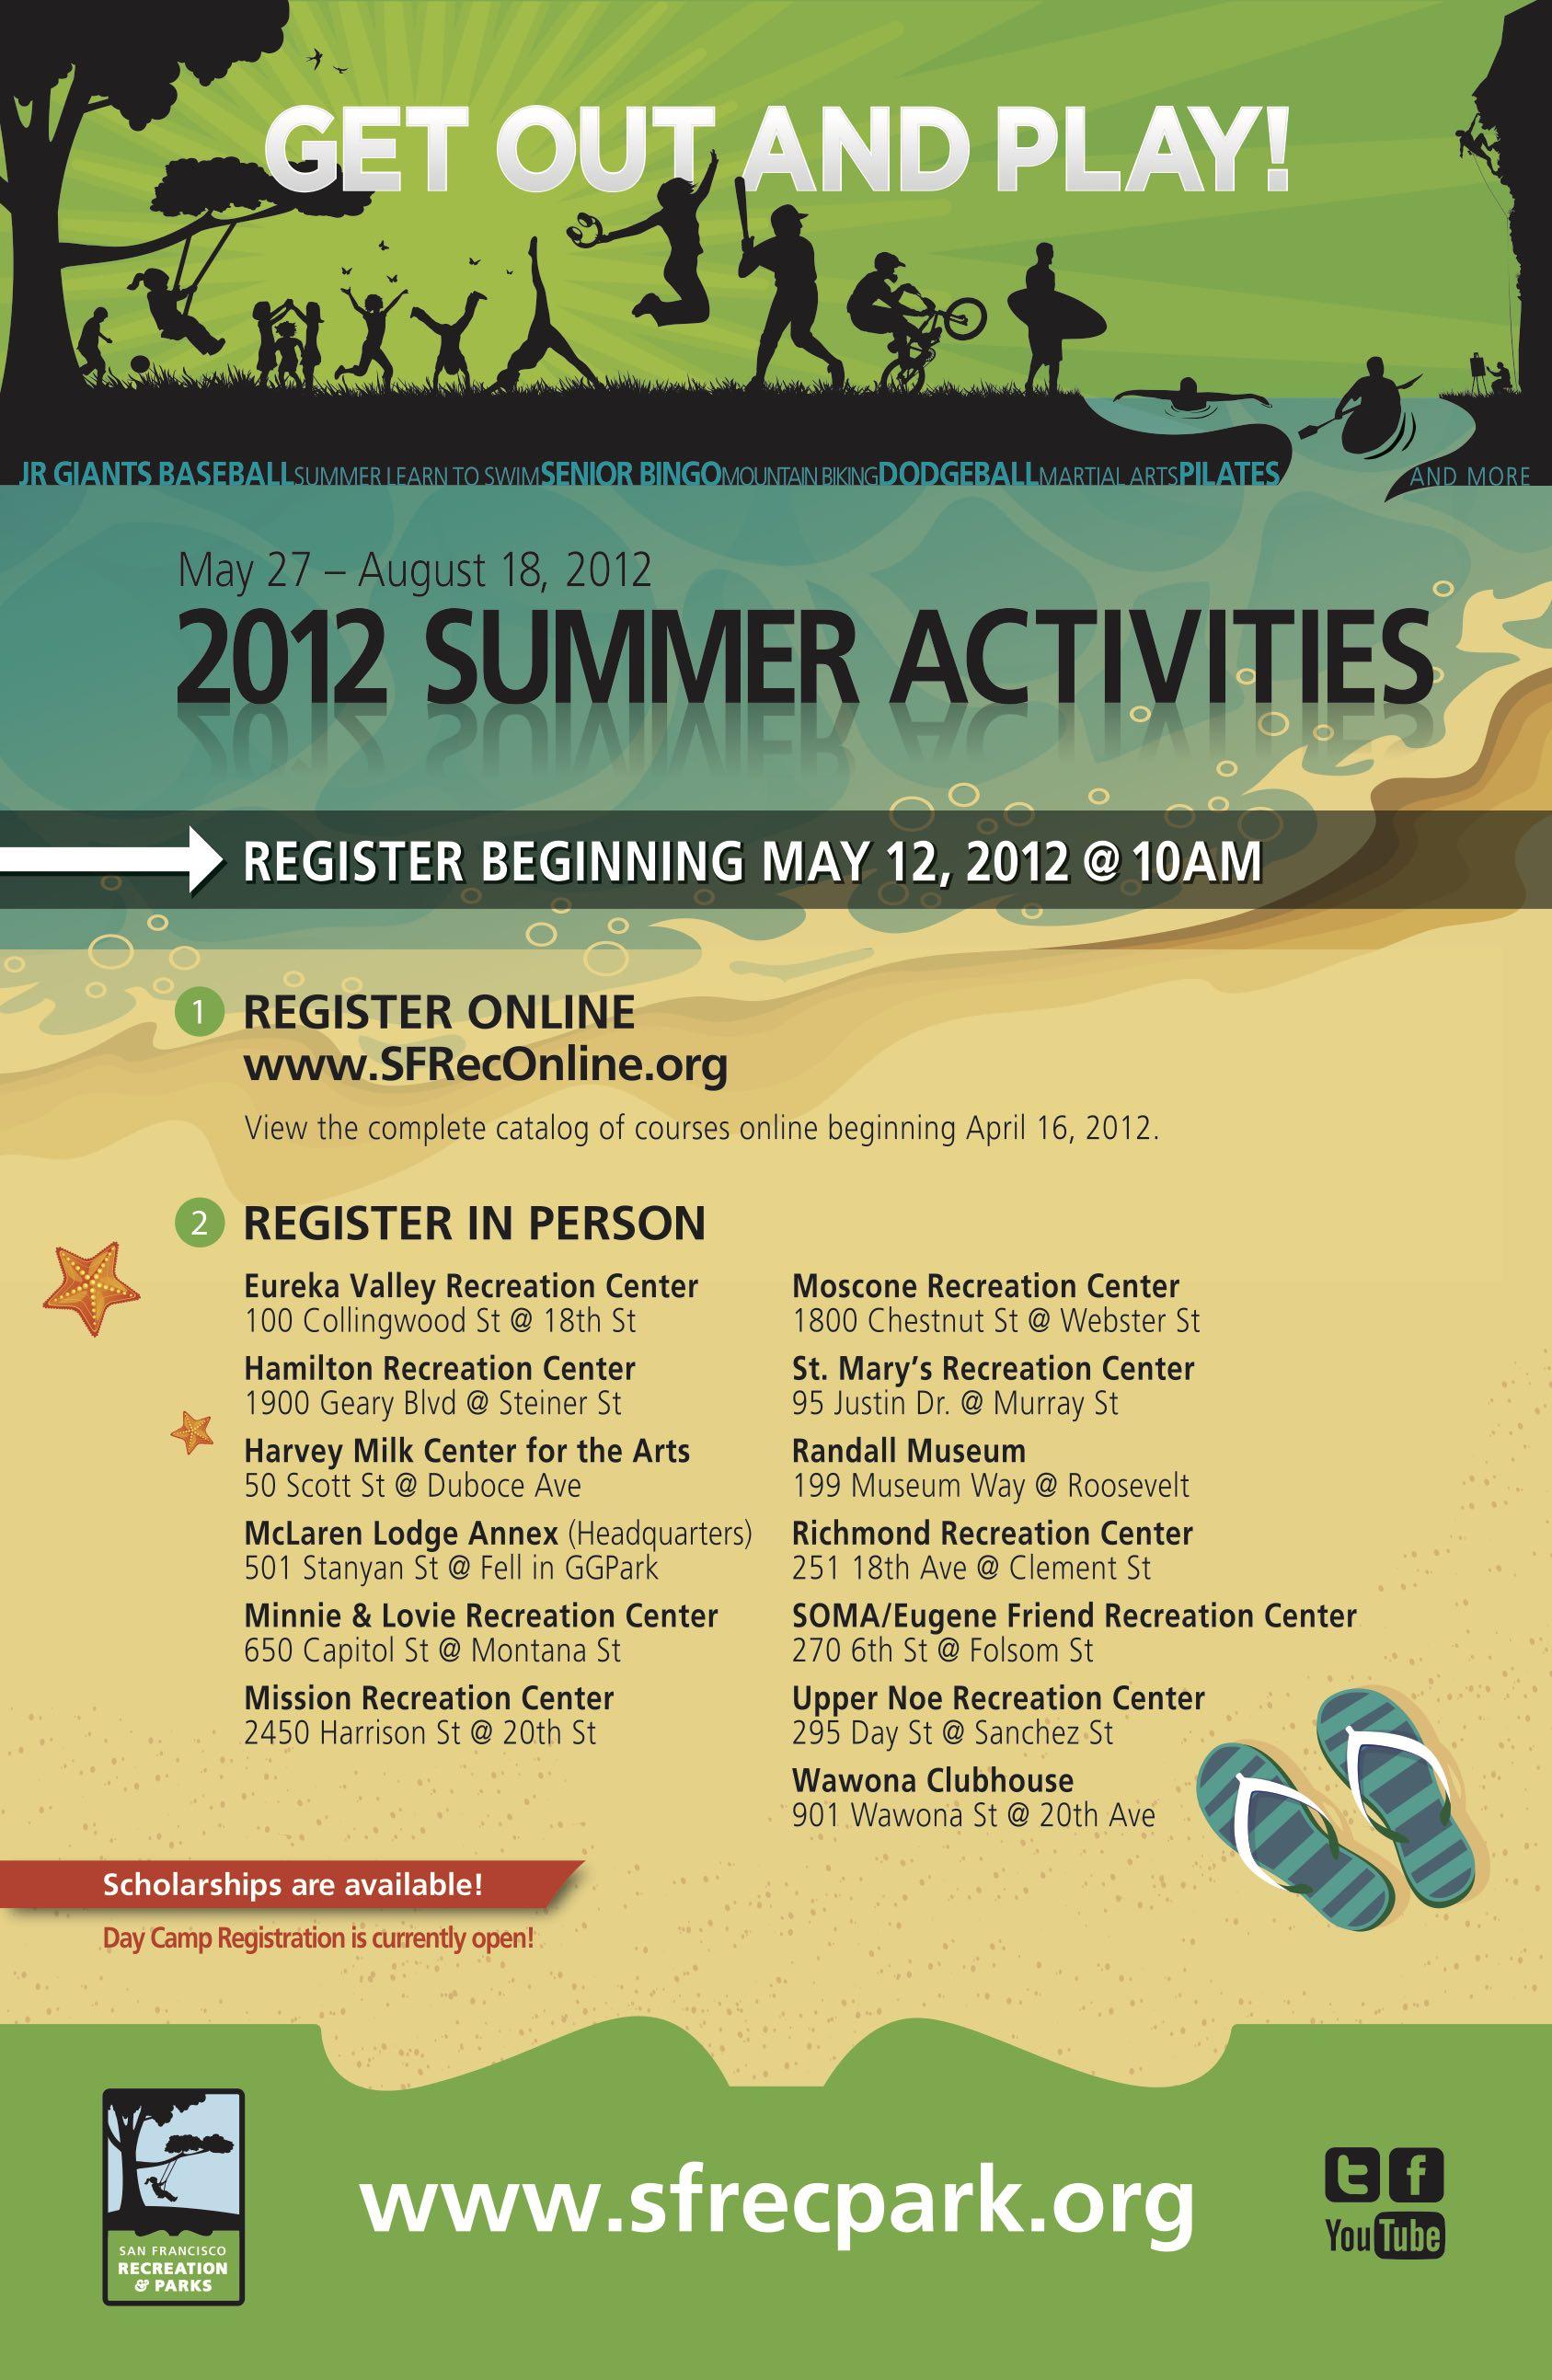 SUMMER_ACTIVITIES_POSTER_11X17_2012.jpg